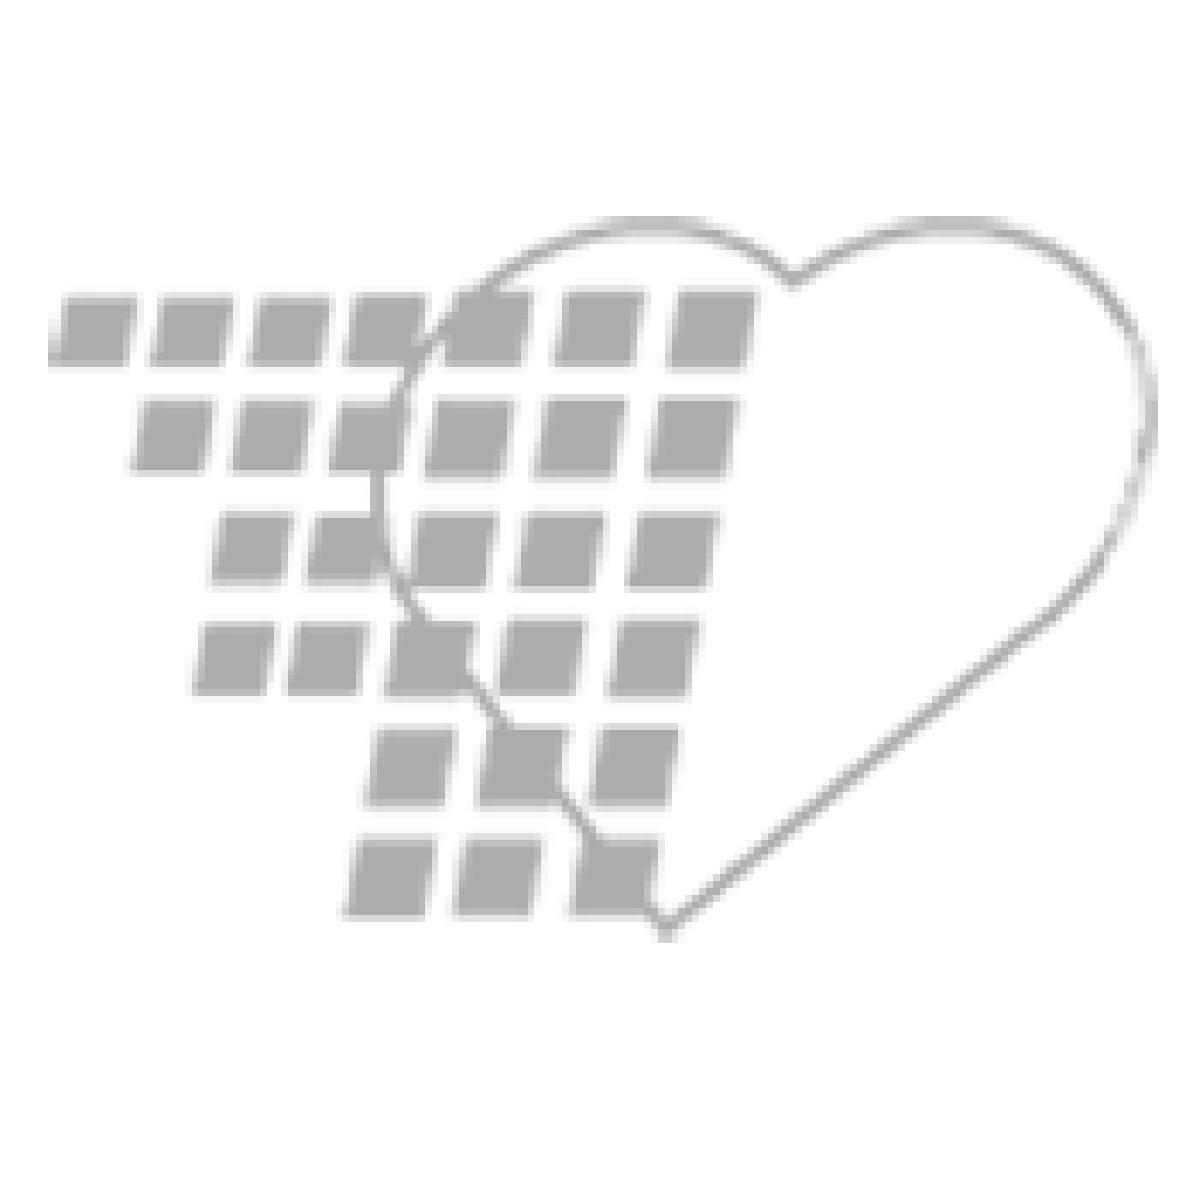 10-81-0980 Pat Pressure Ulcer Model™